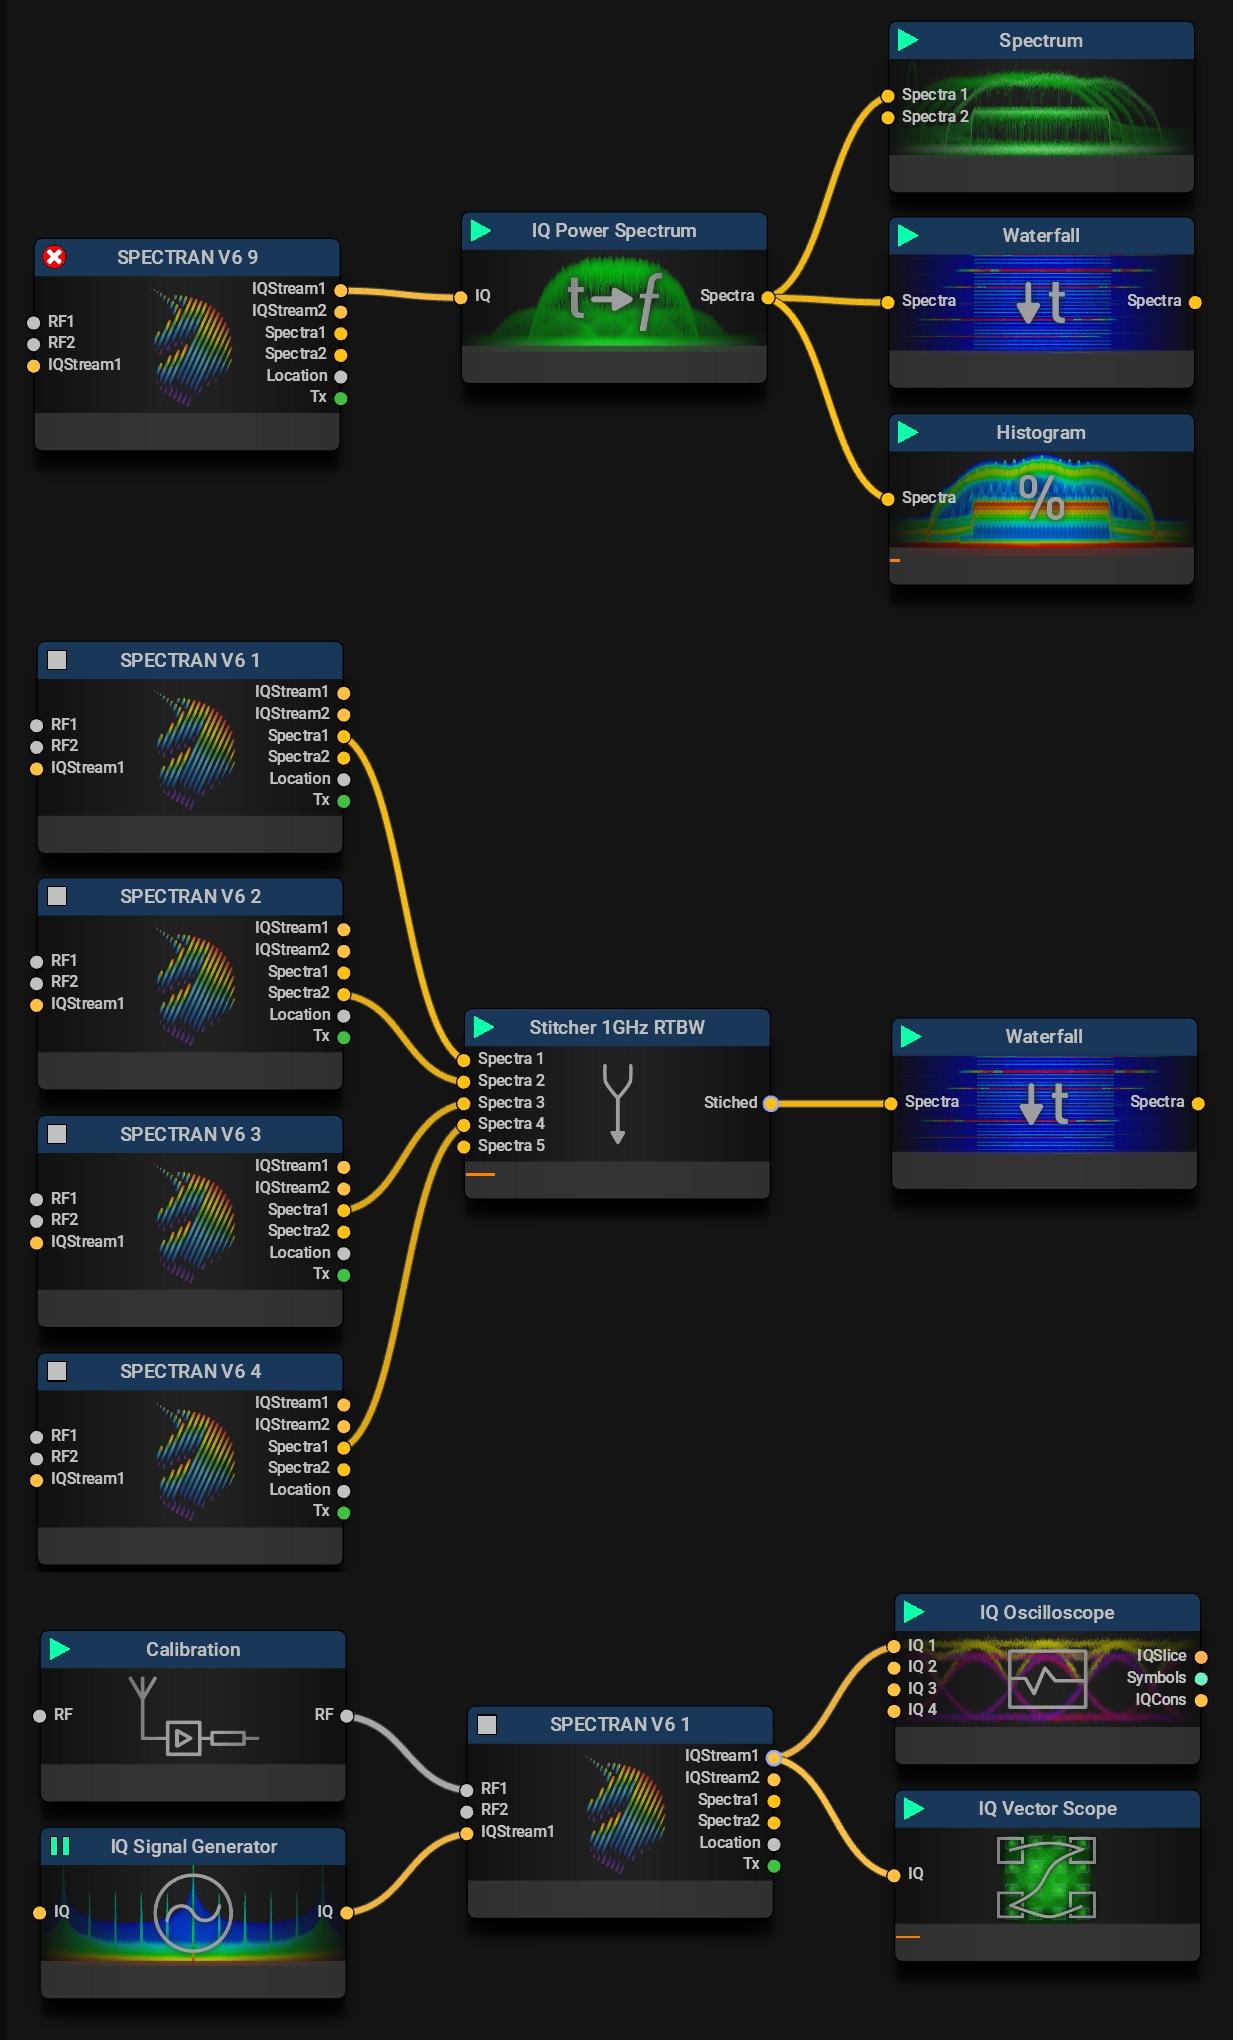 SPECTRAN V6 | Mission Examples